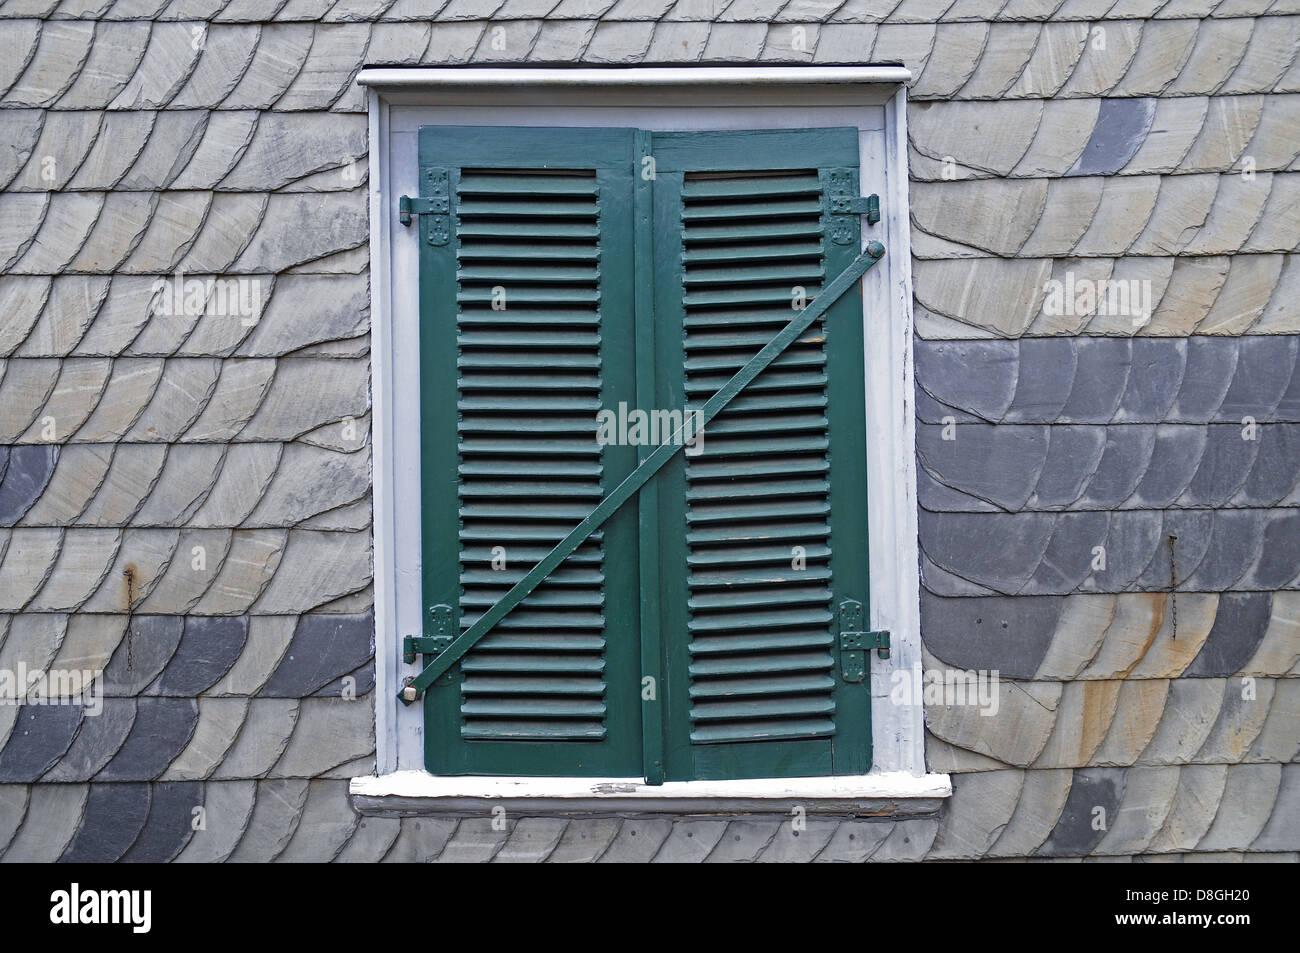 gruenes Fenster - Stock Image